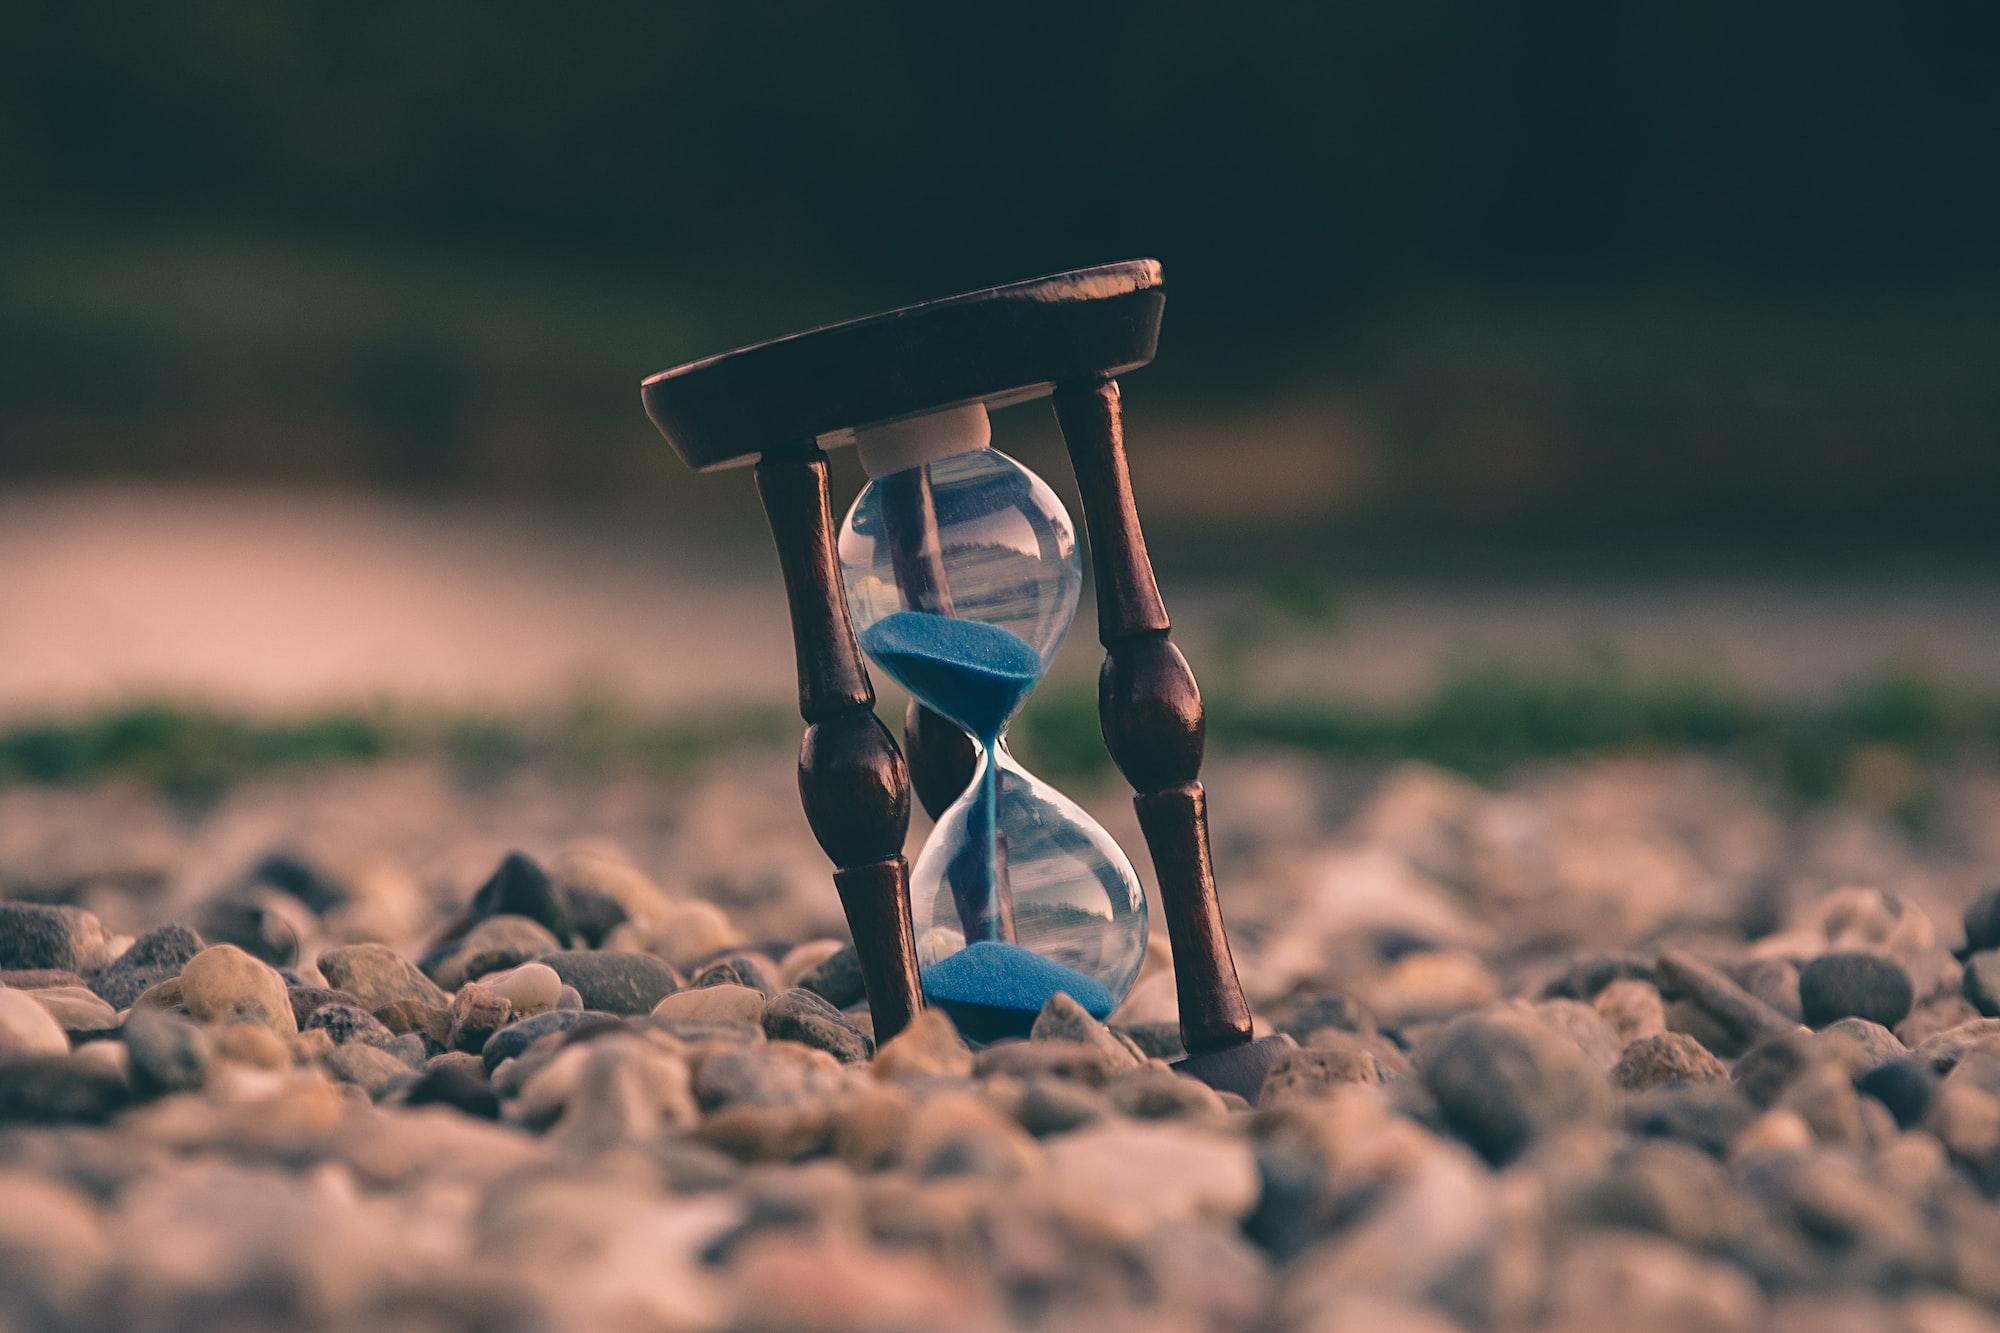 Get Content Reading Time Estimation